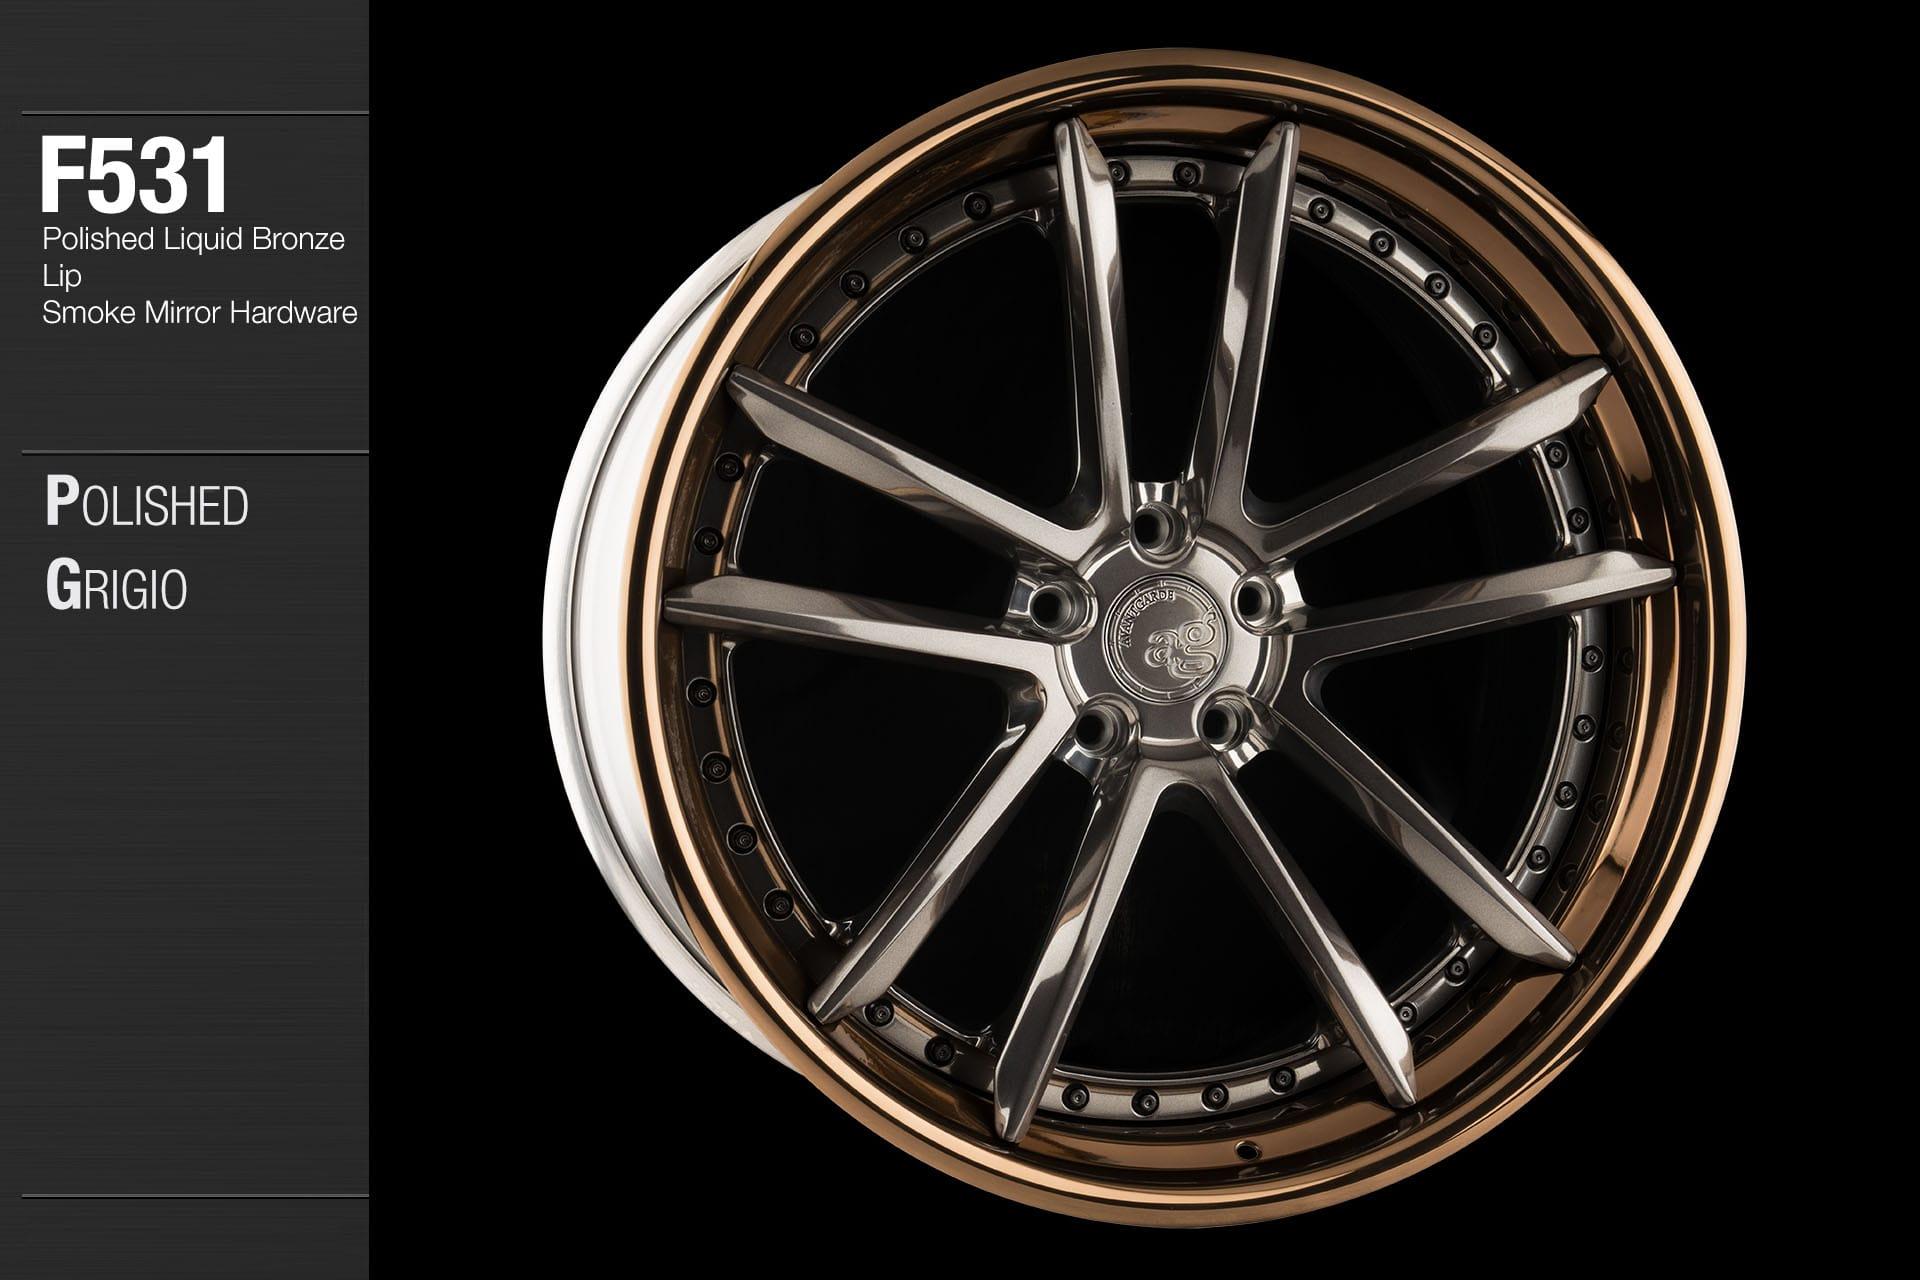 avant-garde-ag-wheels-f531-polished-grigio-face-liquid-bronze-lip-smoke-mirror-hardware-4-min